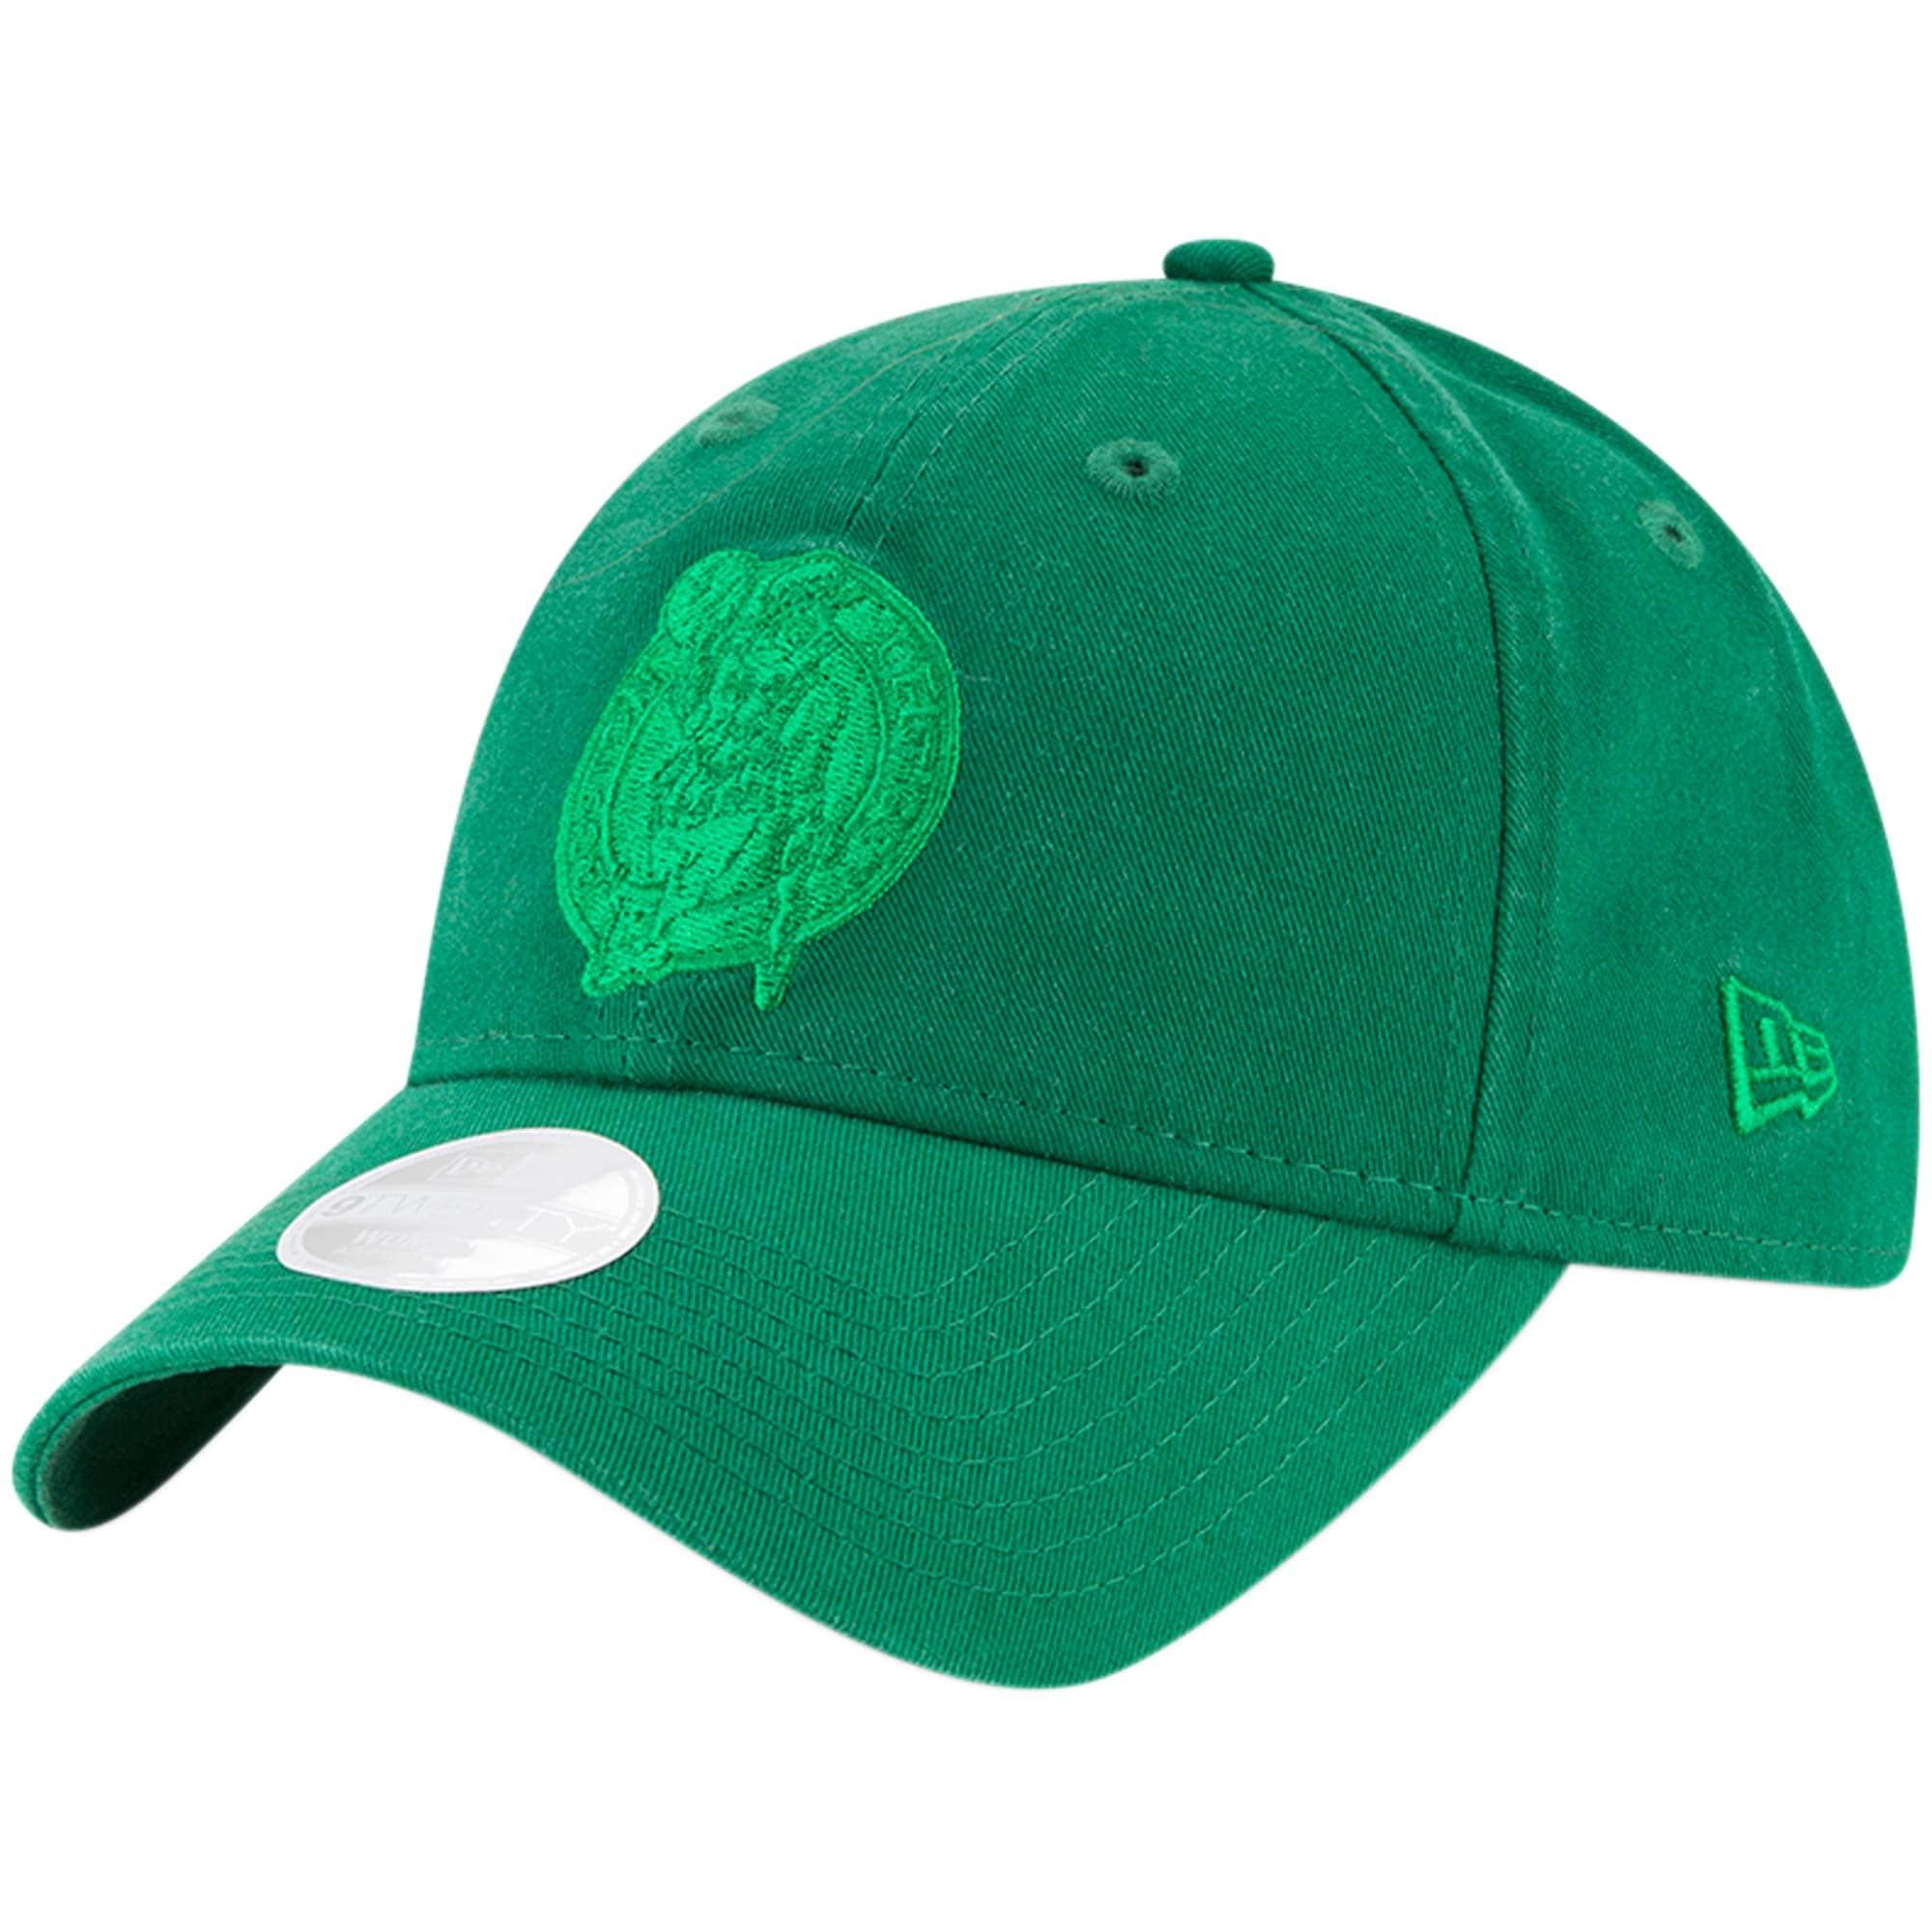 Boston Celtics New Era Women's St. Patrick's Day Core Classic 9TWENTY Adjustable Hat - Kelly Green